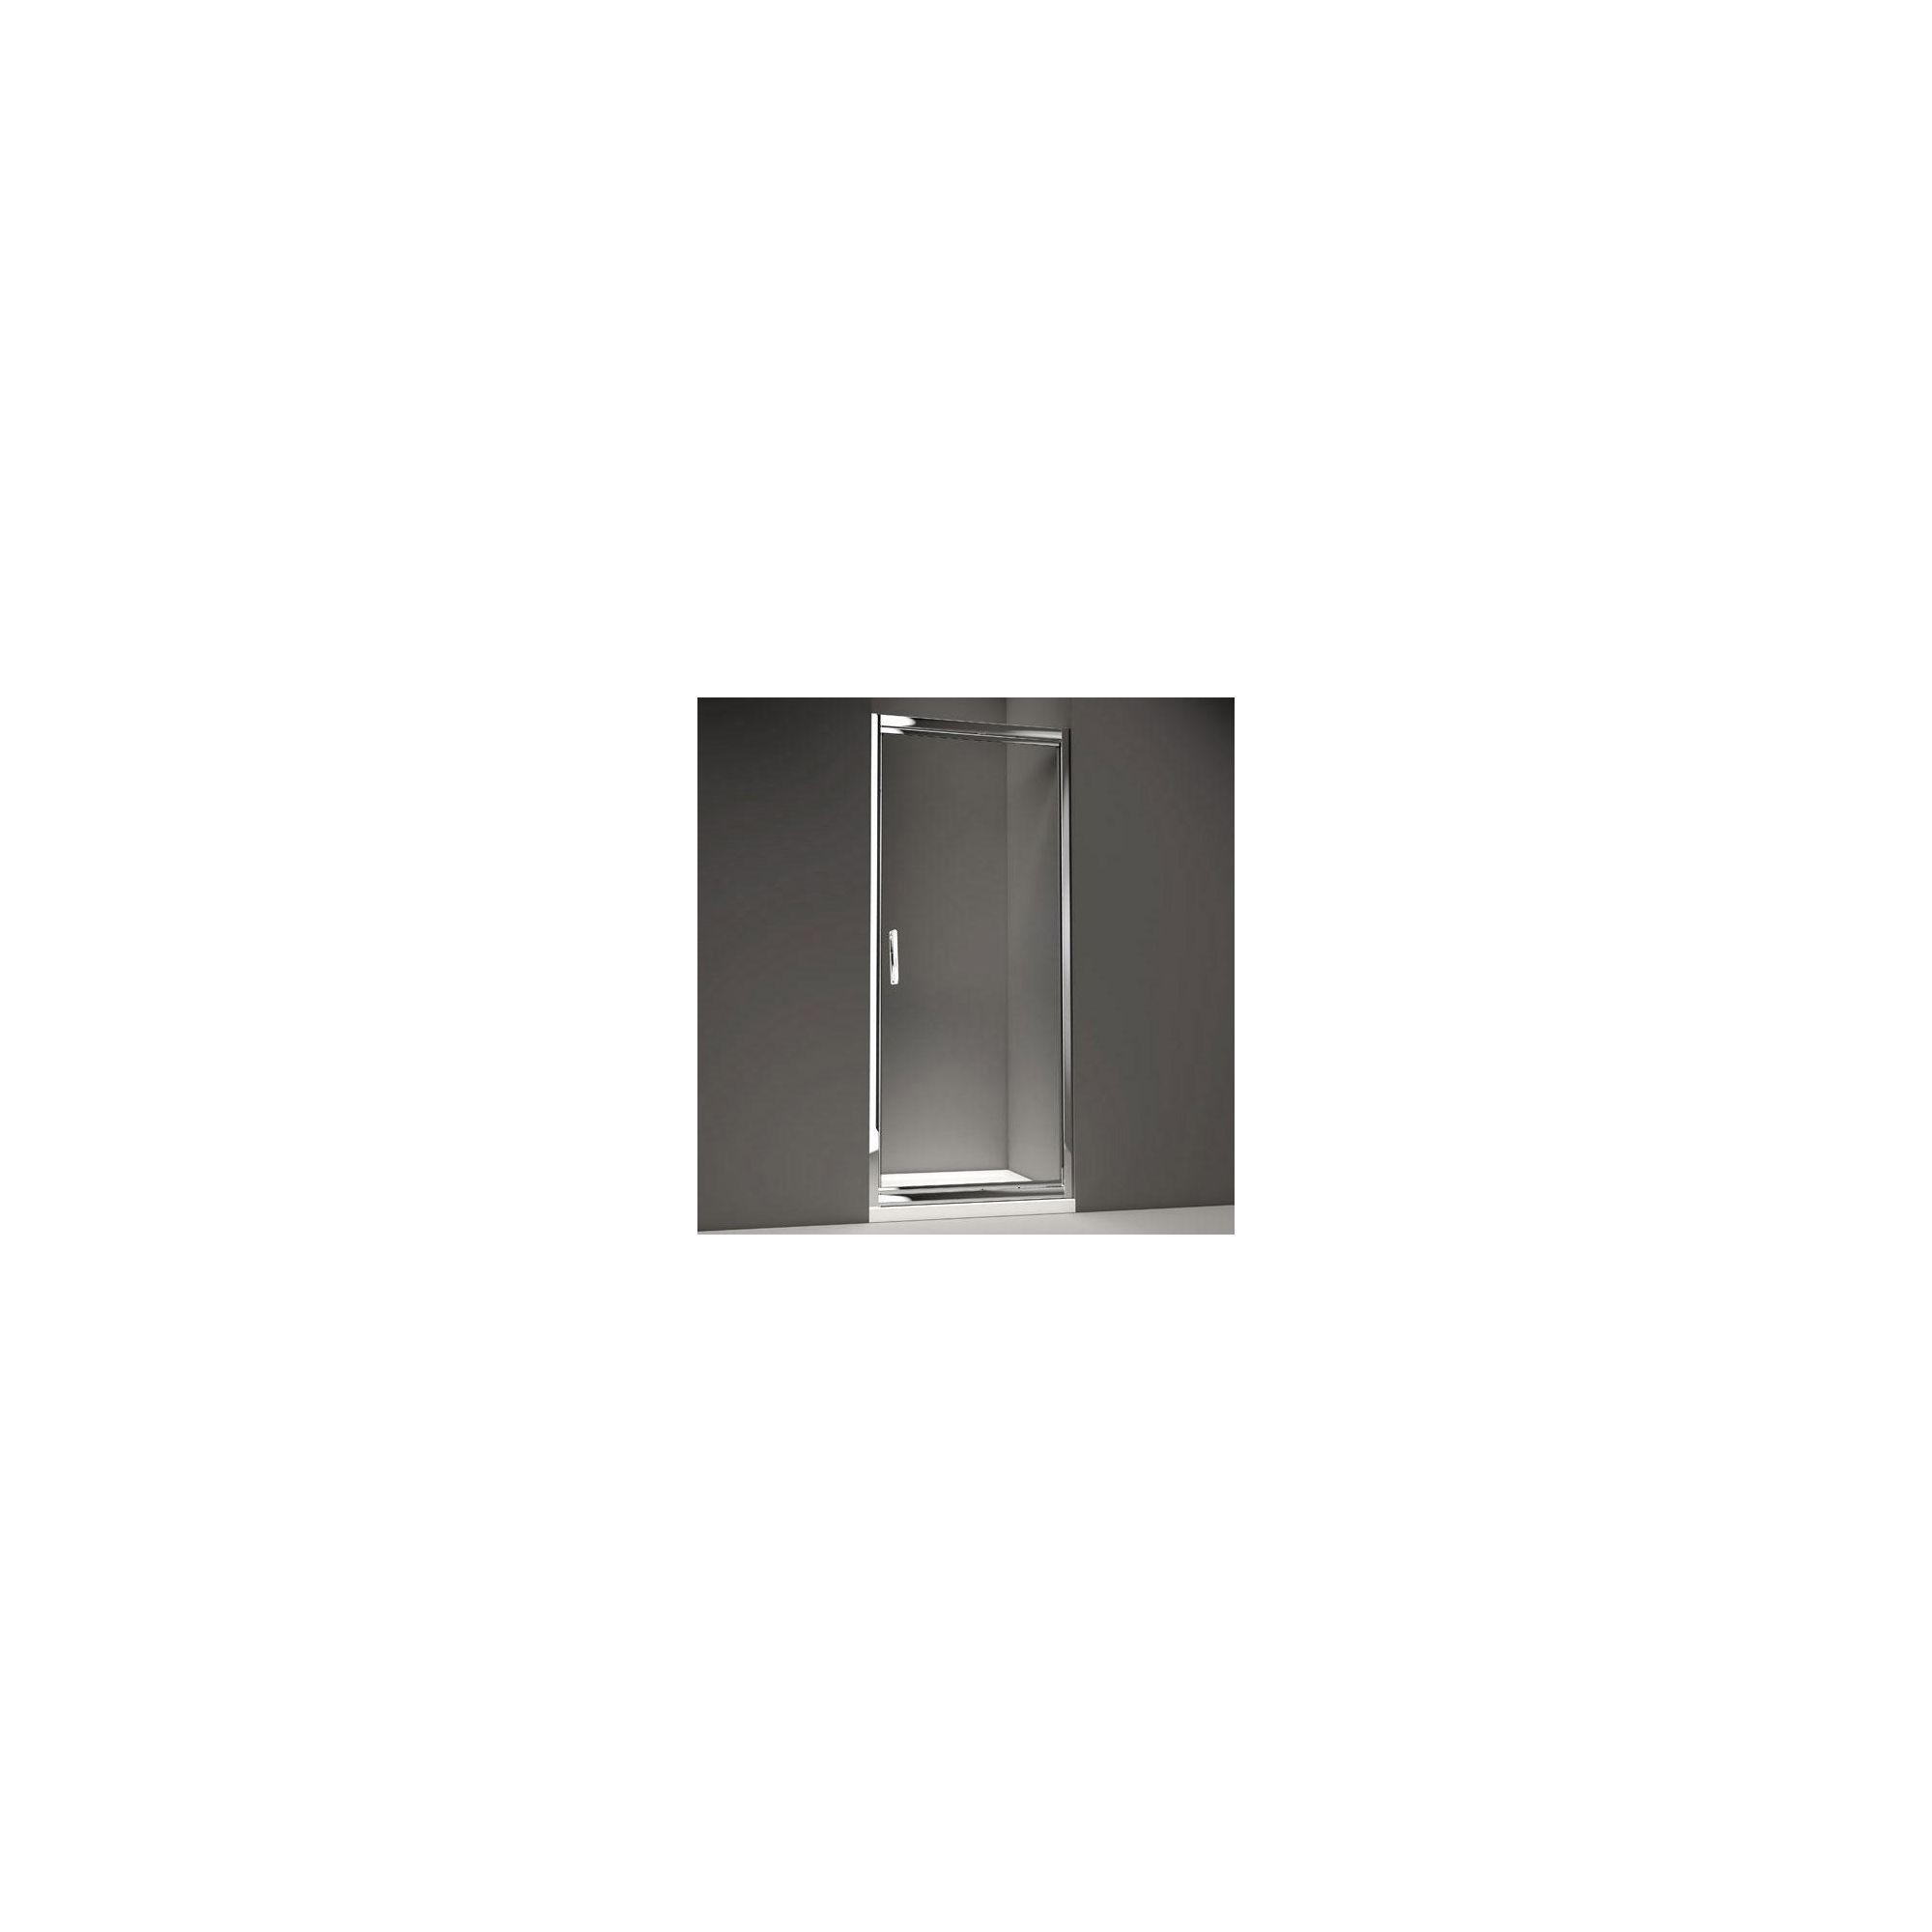 Merlyn Series 8 Infold Shower Door, 700mm Wide, Chrome Frame, 8mm Glass at Tescos Direct